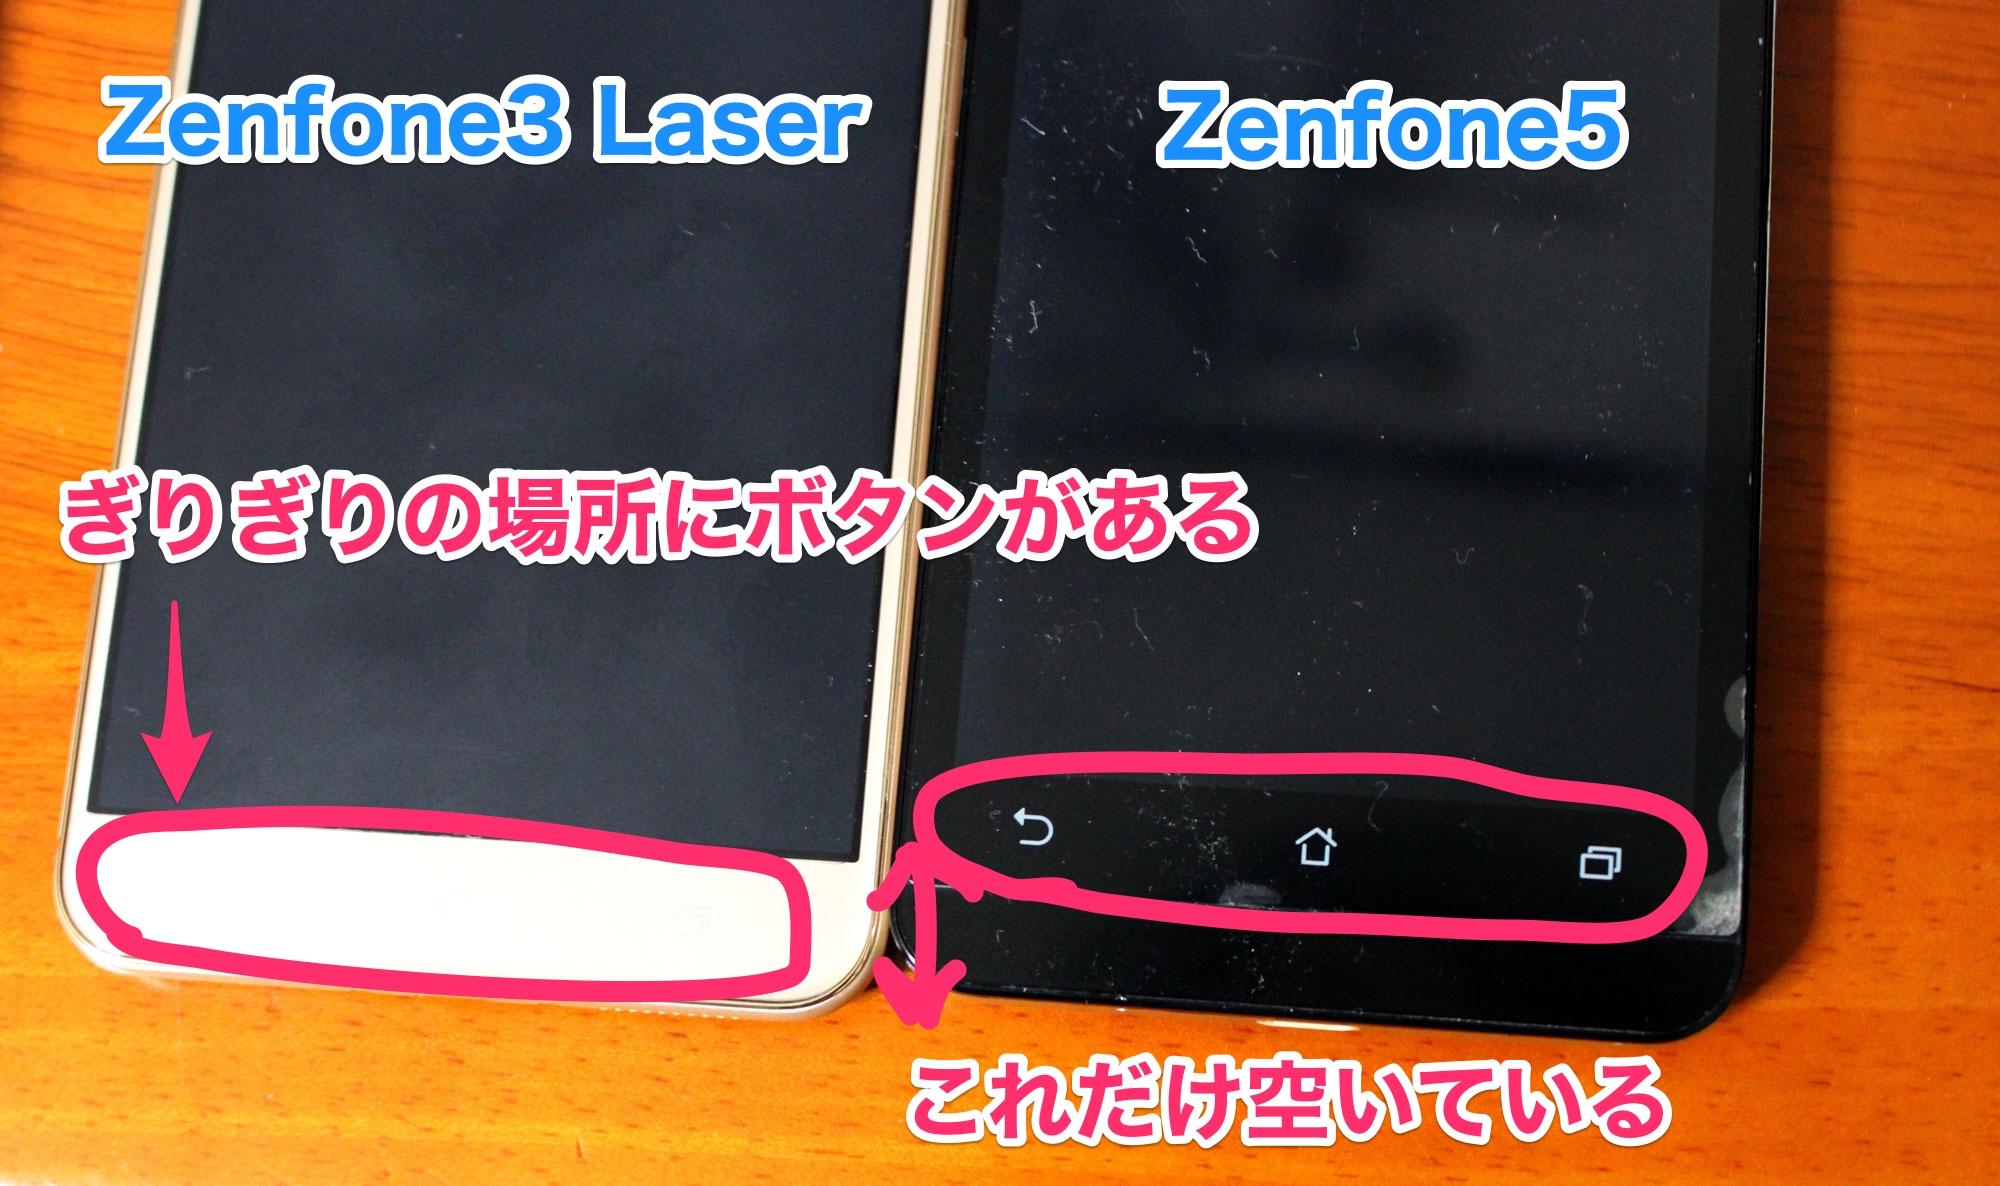 Zenfone3 LaserとZenfone5のボタンの場所比較